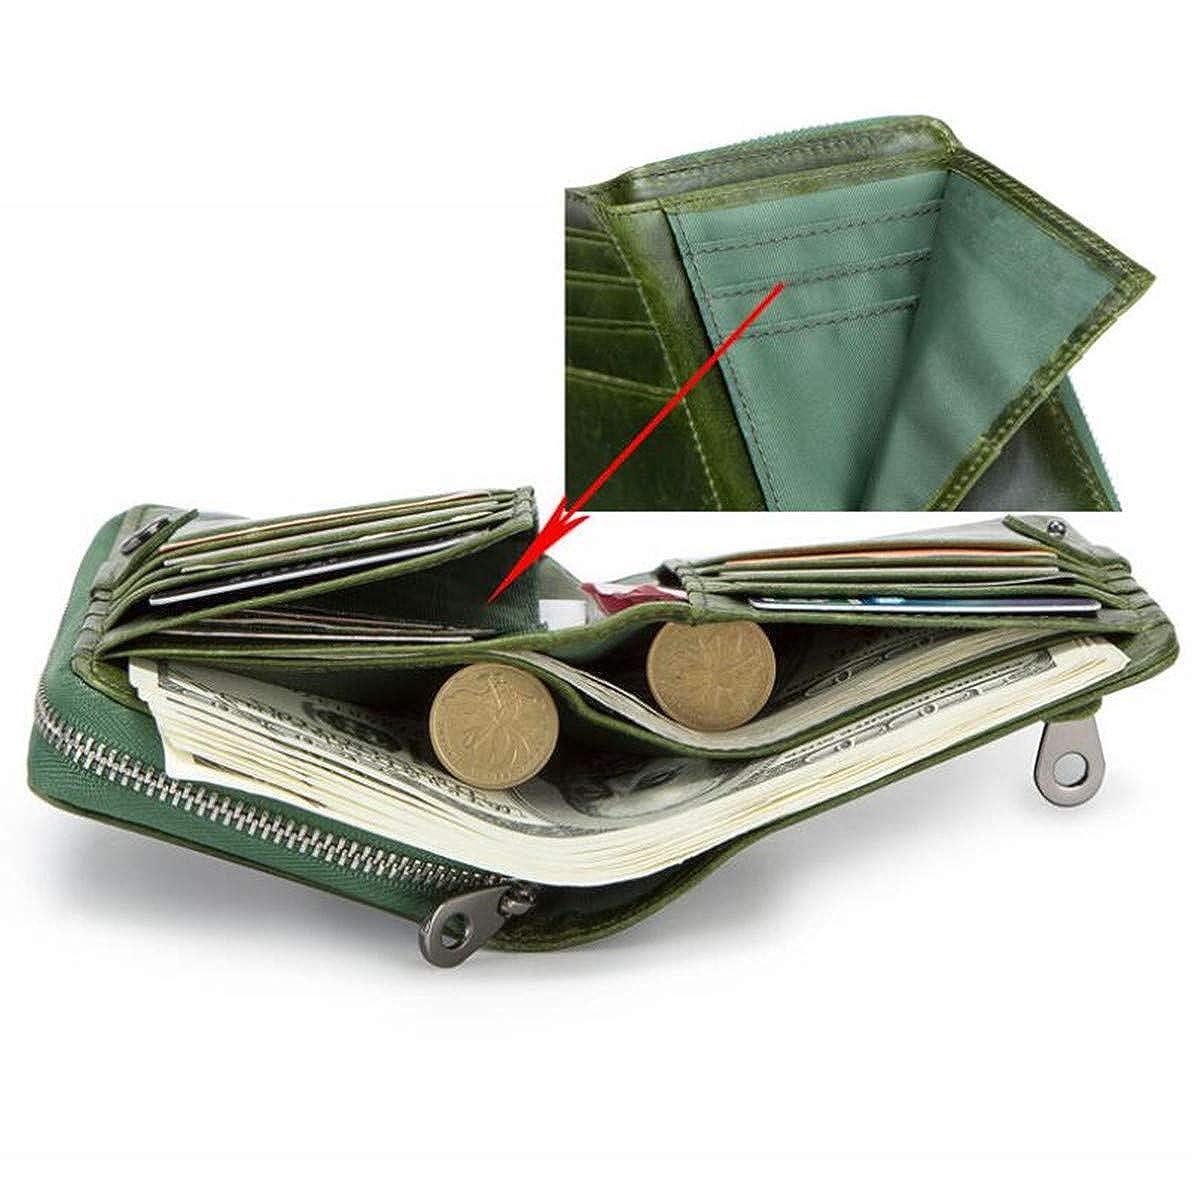 961cf666c939 LJYH Women's Coin purse Genuine Leather Bifold Wallet Multi-Card ...